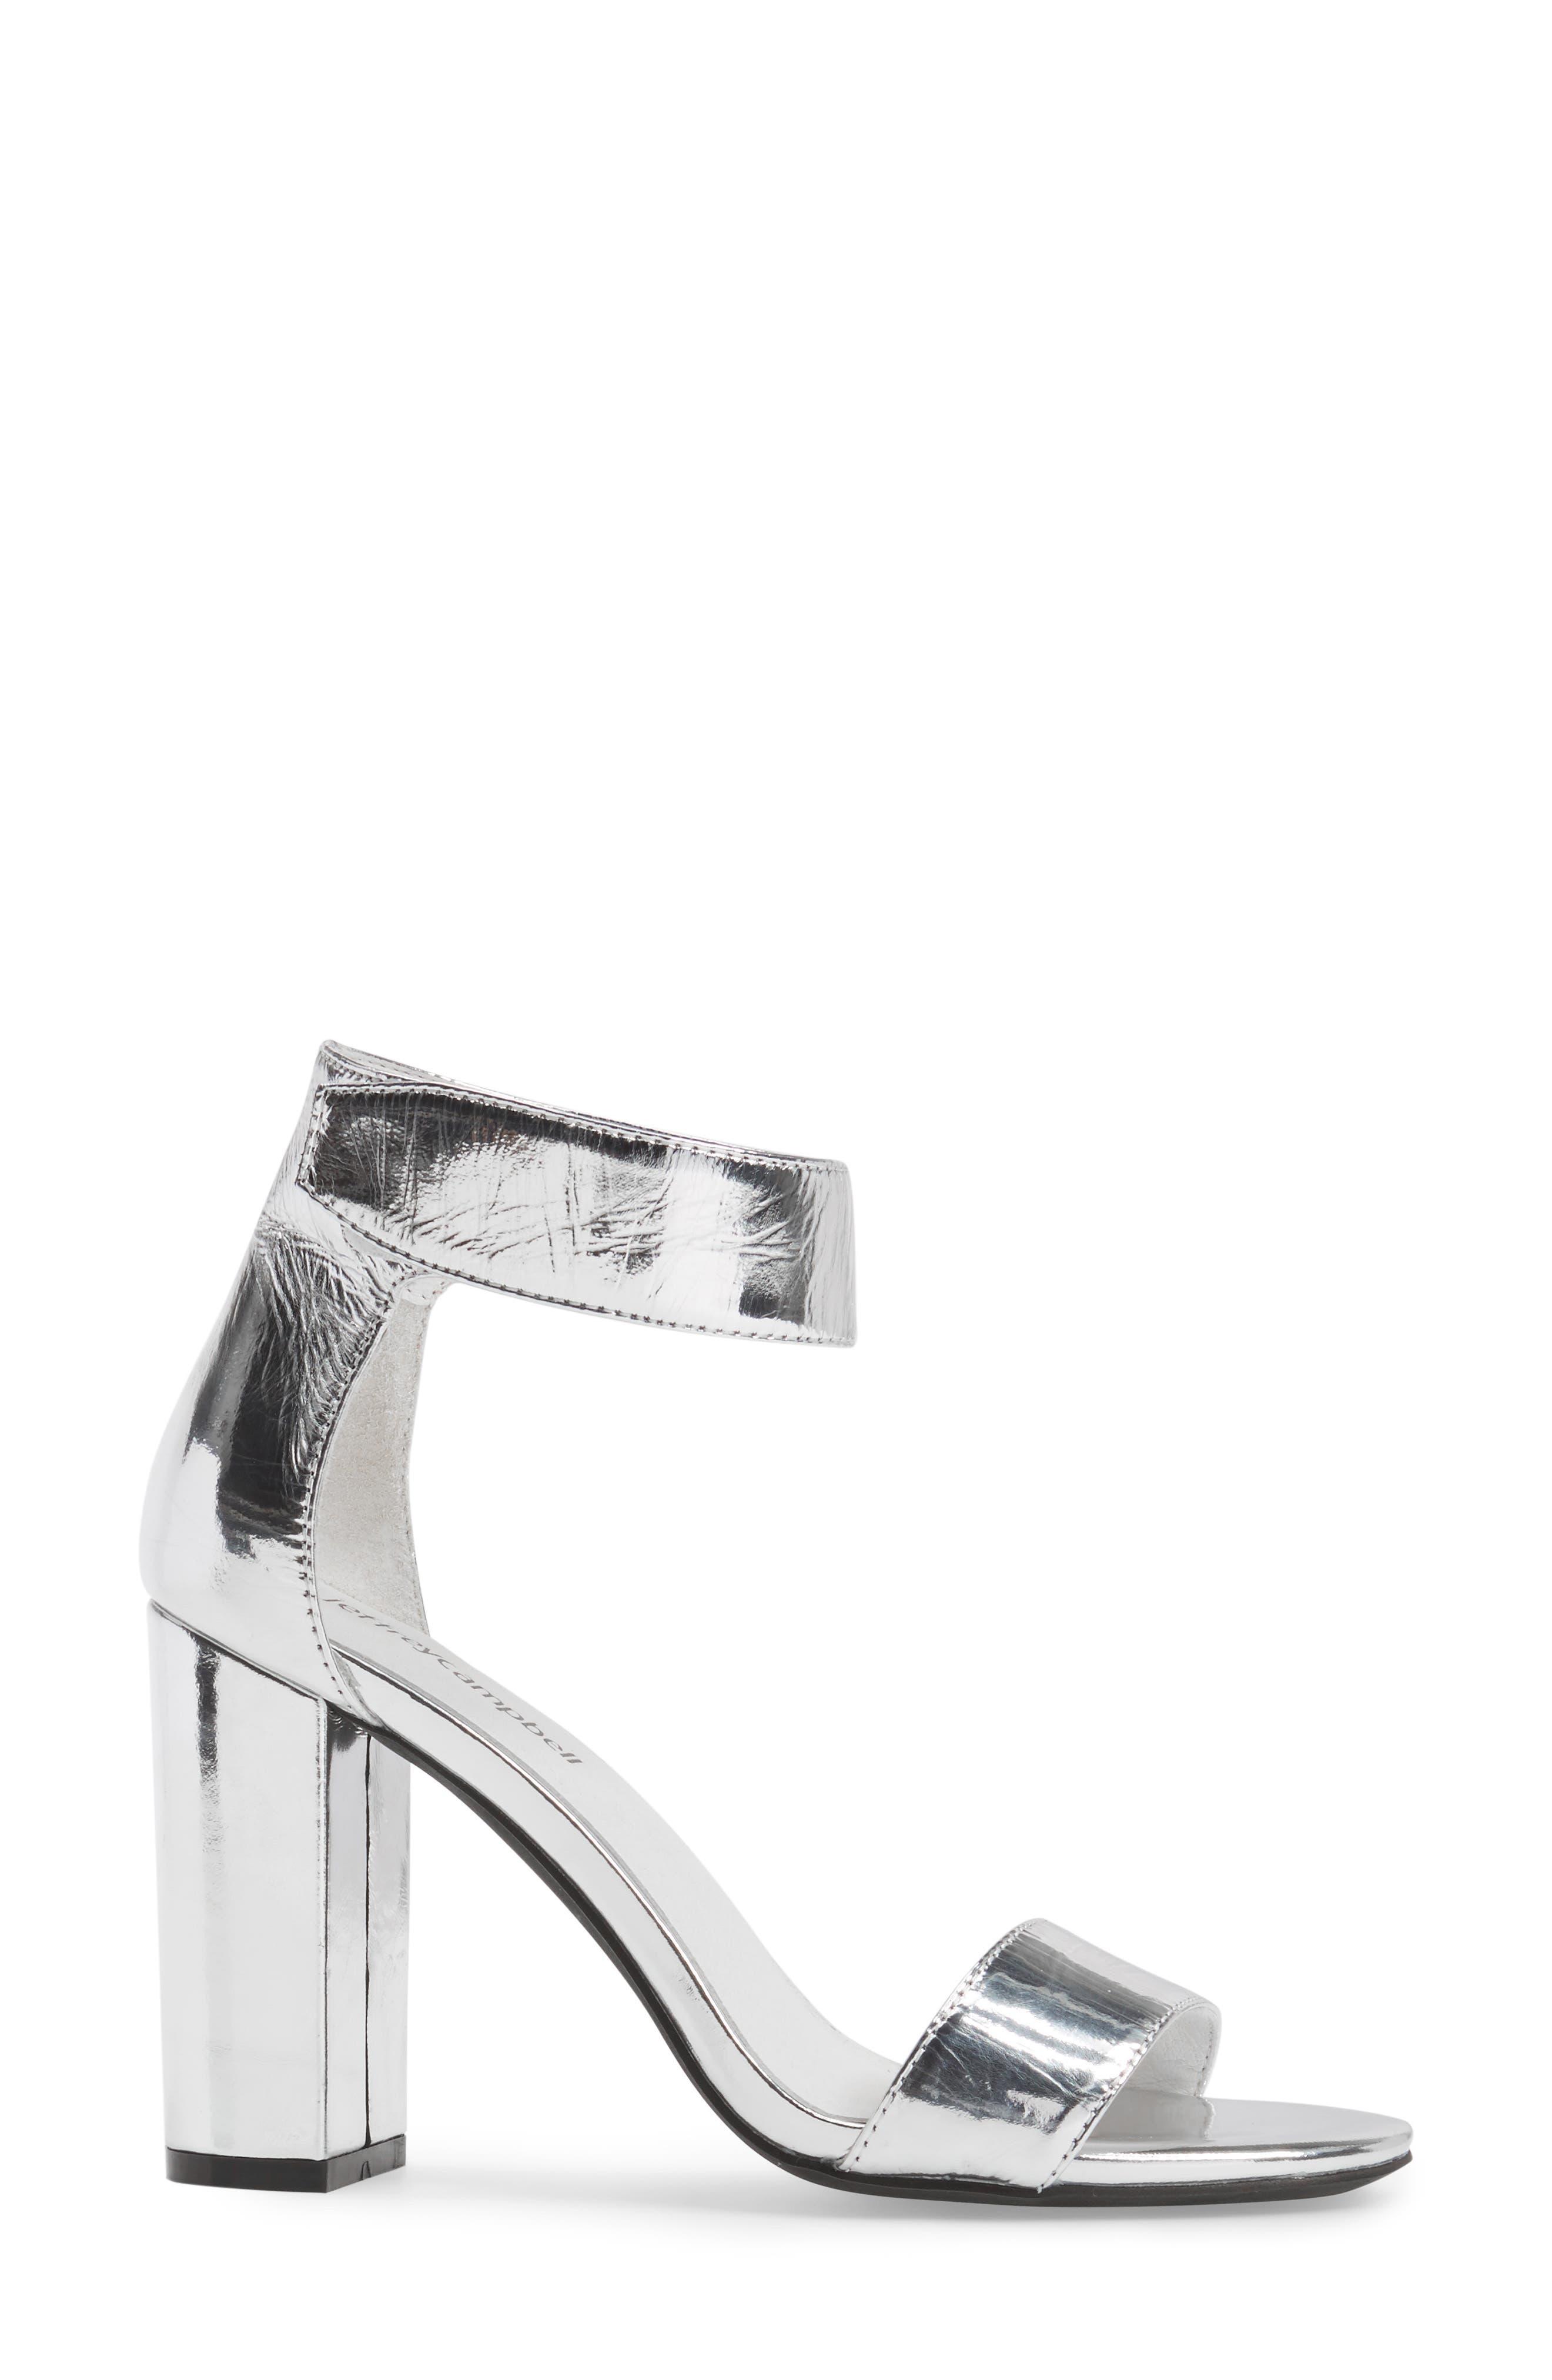 'Lindsay' Ankle Strap Sandal,                             Alternate thumbnail 3, color,                             Silver